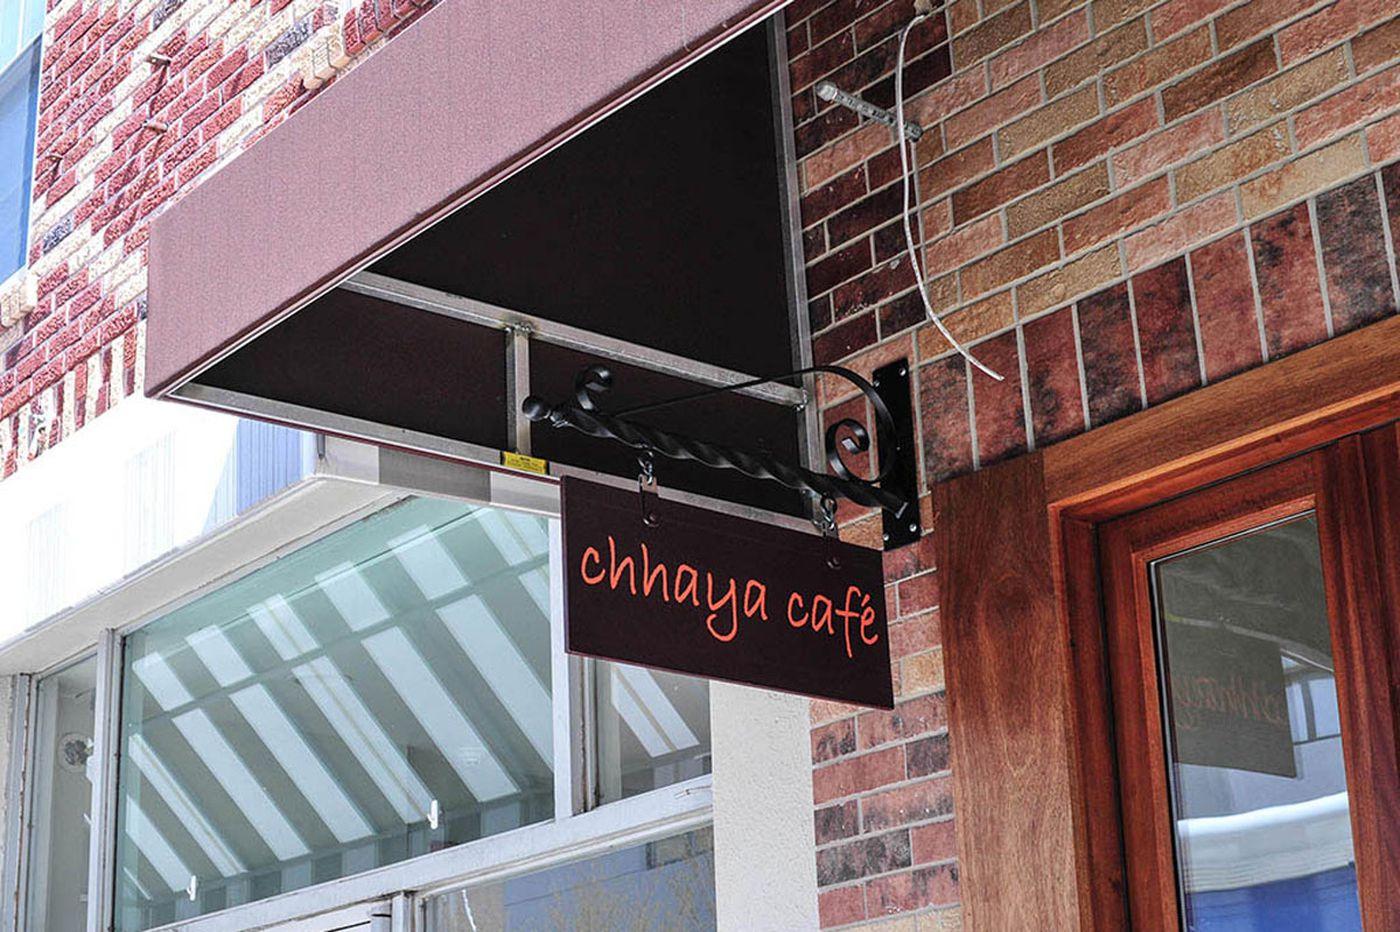 Restaurant veteran buys Chhaya Cafe in South Philadelphia